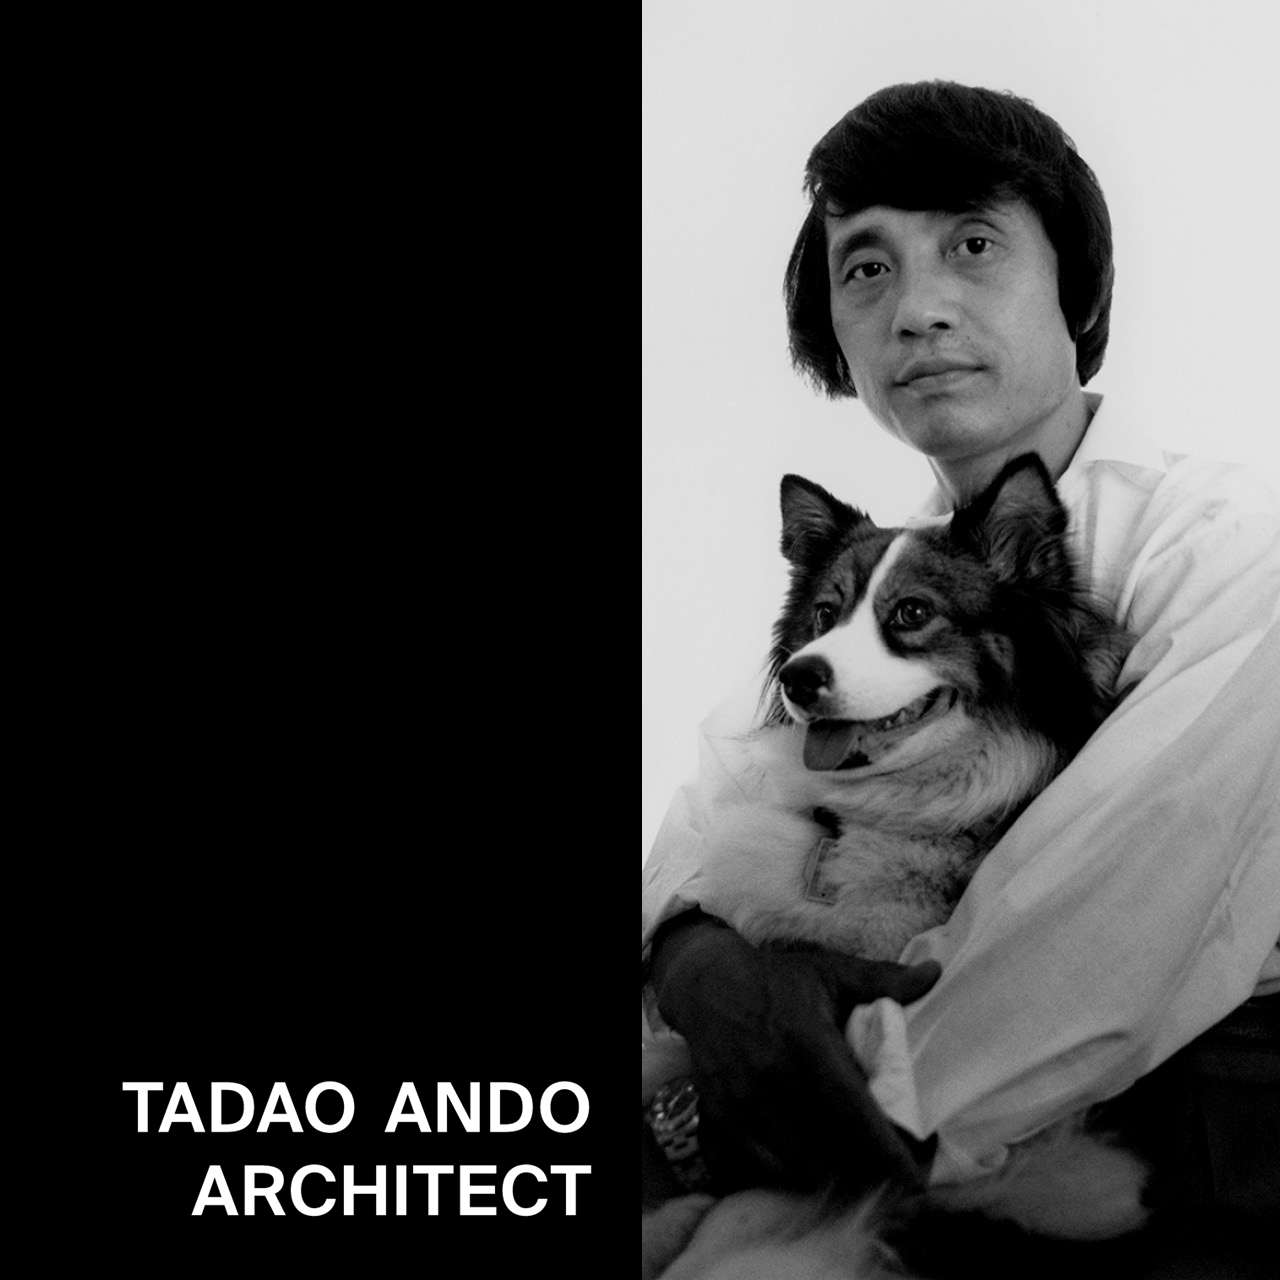 Image of young Tadao Ando with his dog